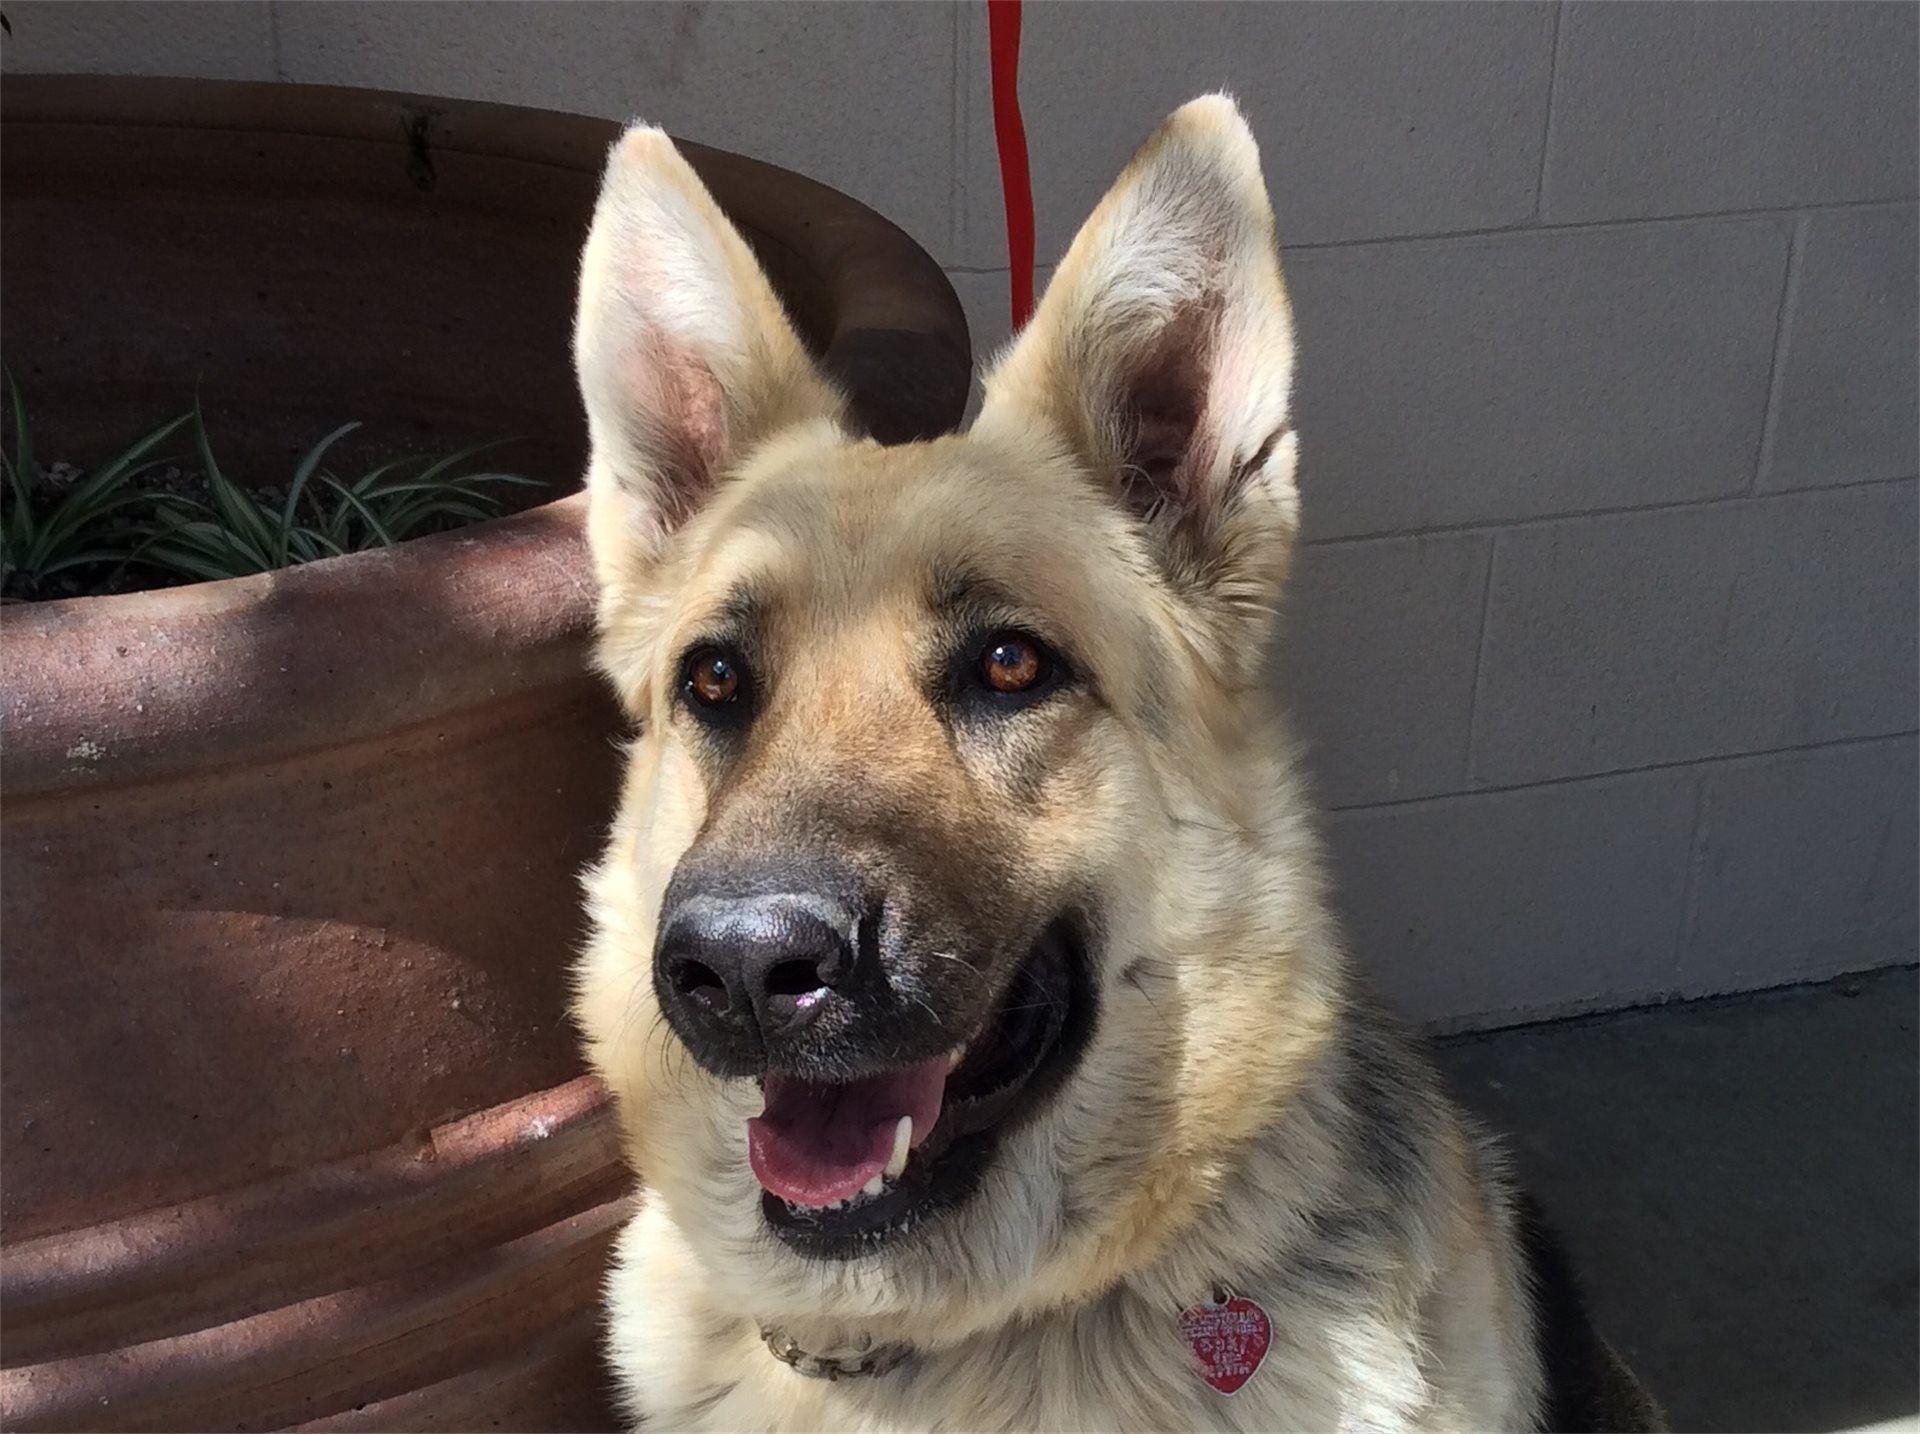 German Shepherd Dog dog for Adoption in pomona, CA. ADN